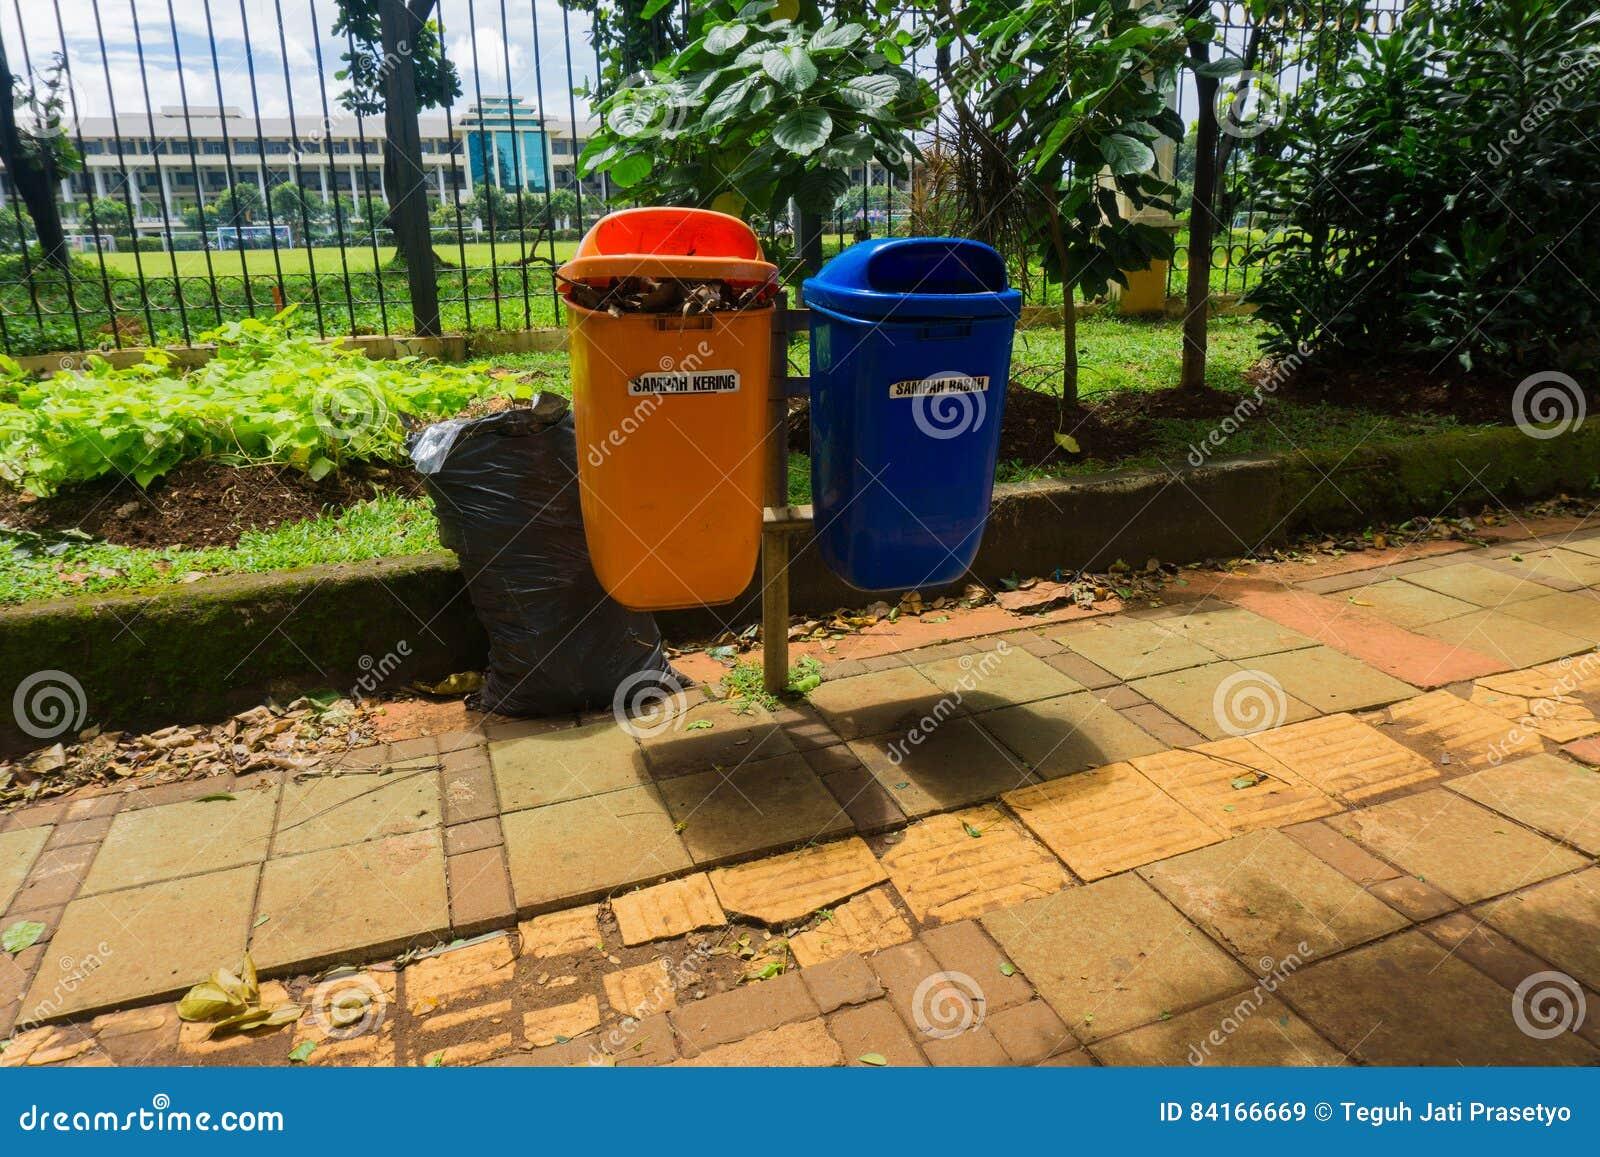 Organic and unorganic trash bin in pedestrian photo taken in Jakarta Indonesia